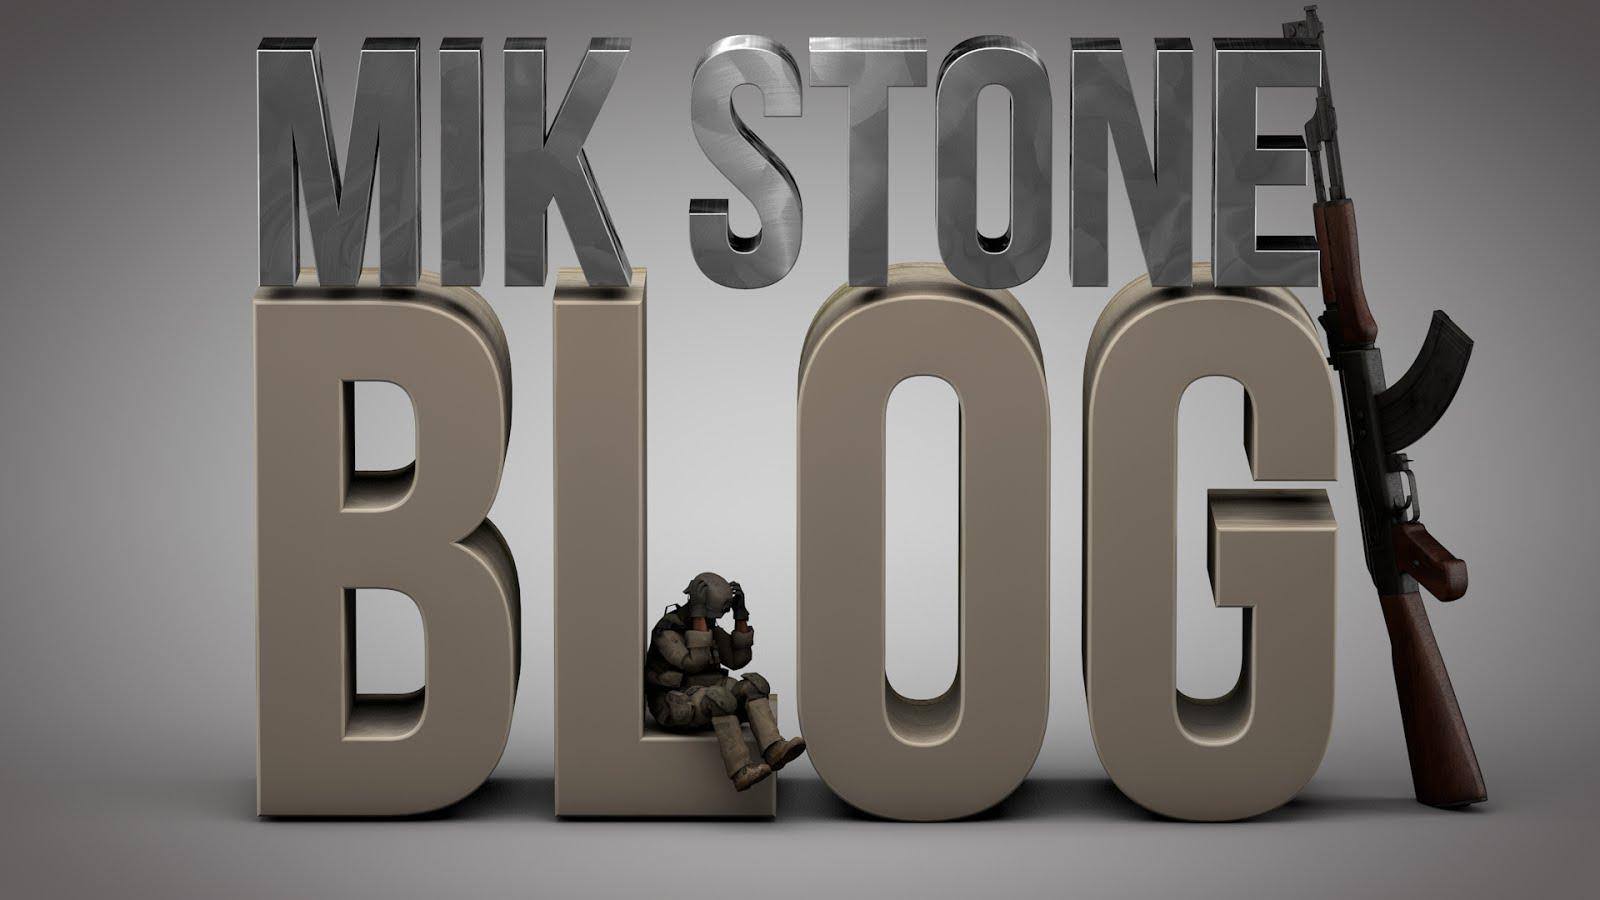 Mikstone blog